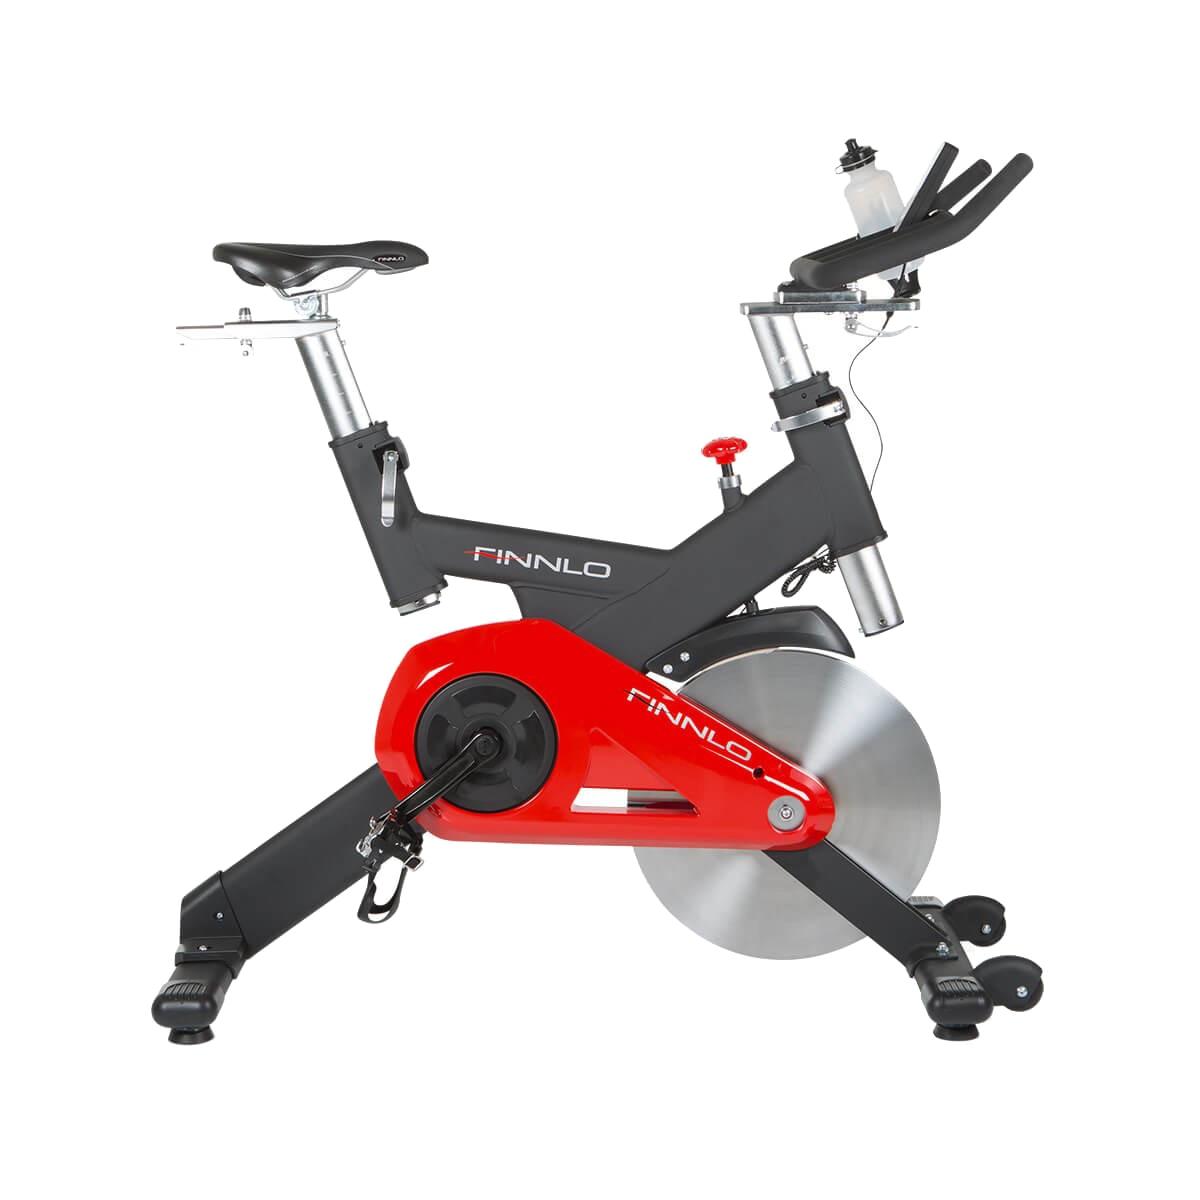 Fotografie Bicicleta spinning Finnlo Speed CRT, volanta 25kg, greutate maxima utilizator 150kg